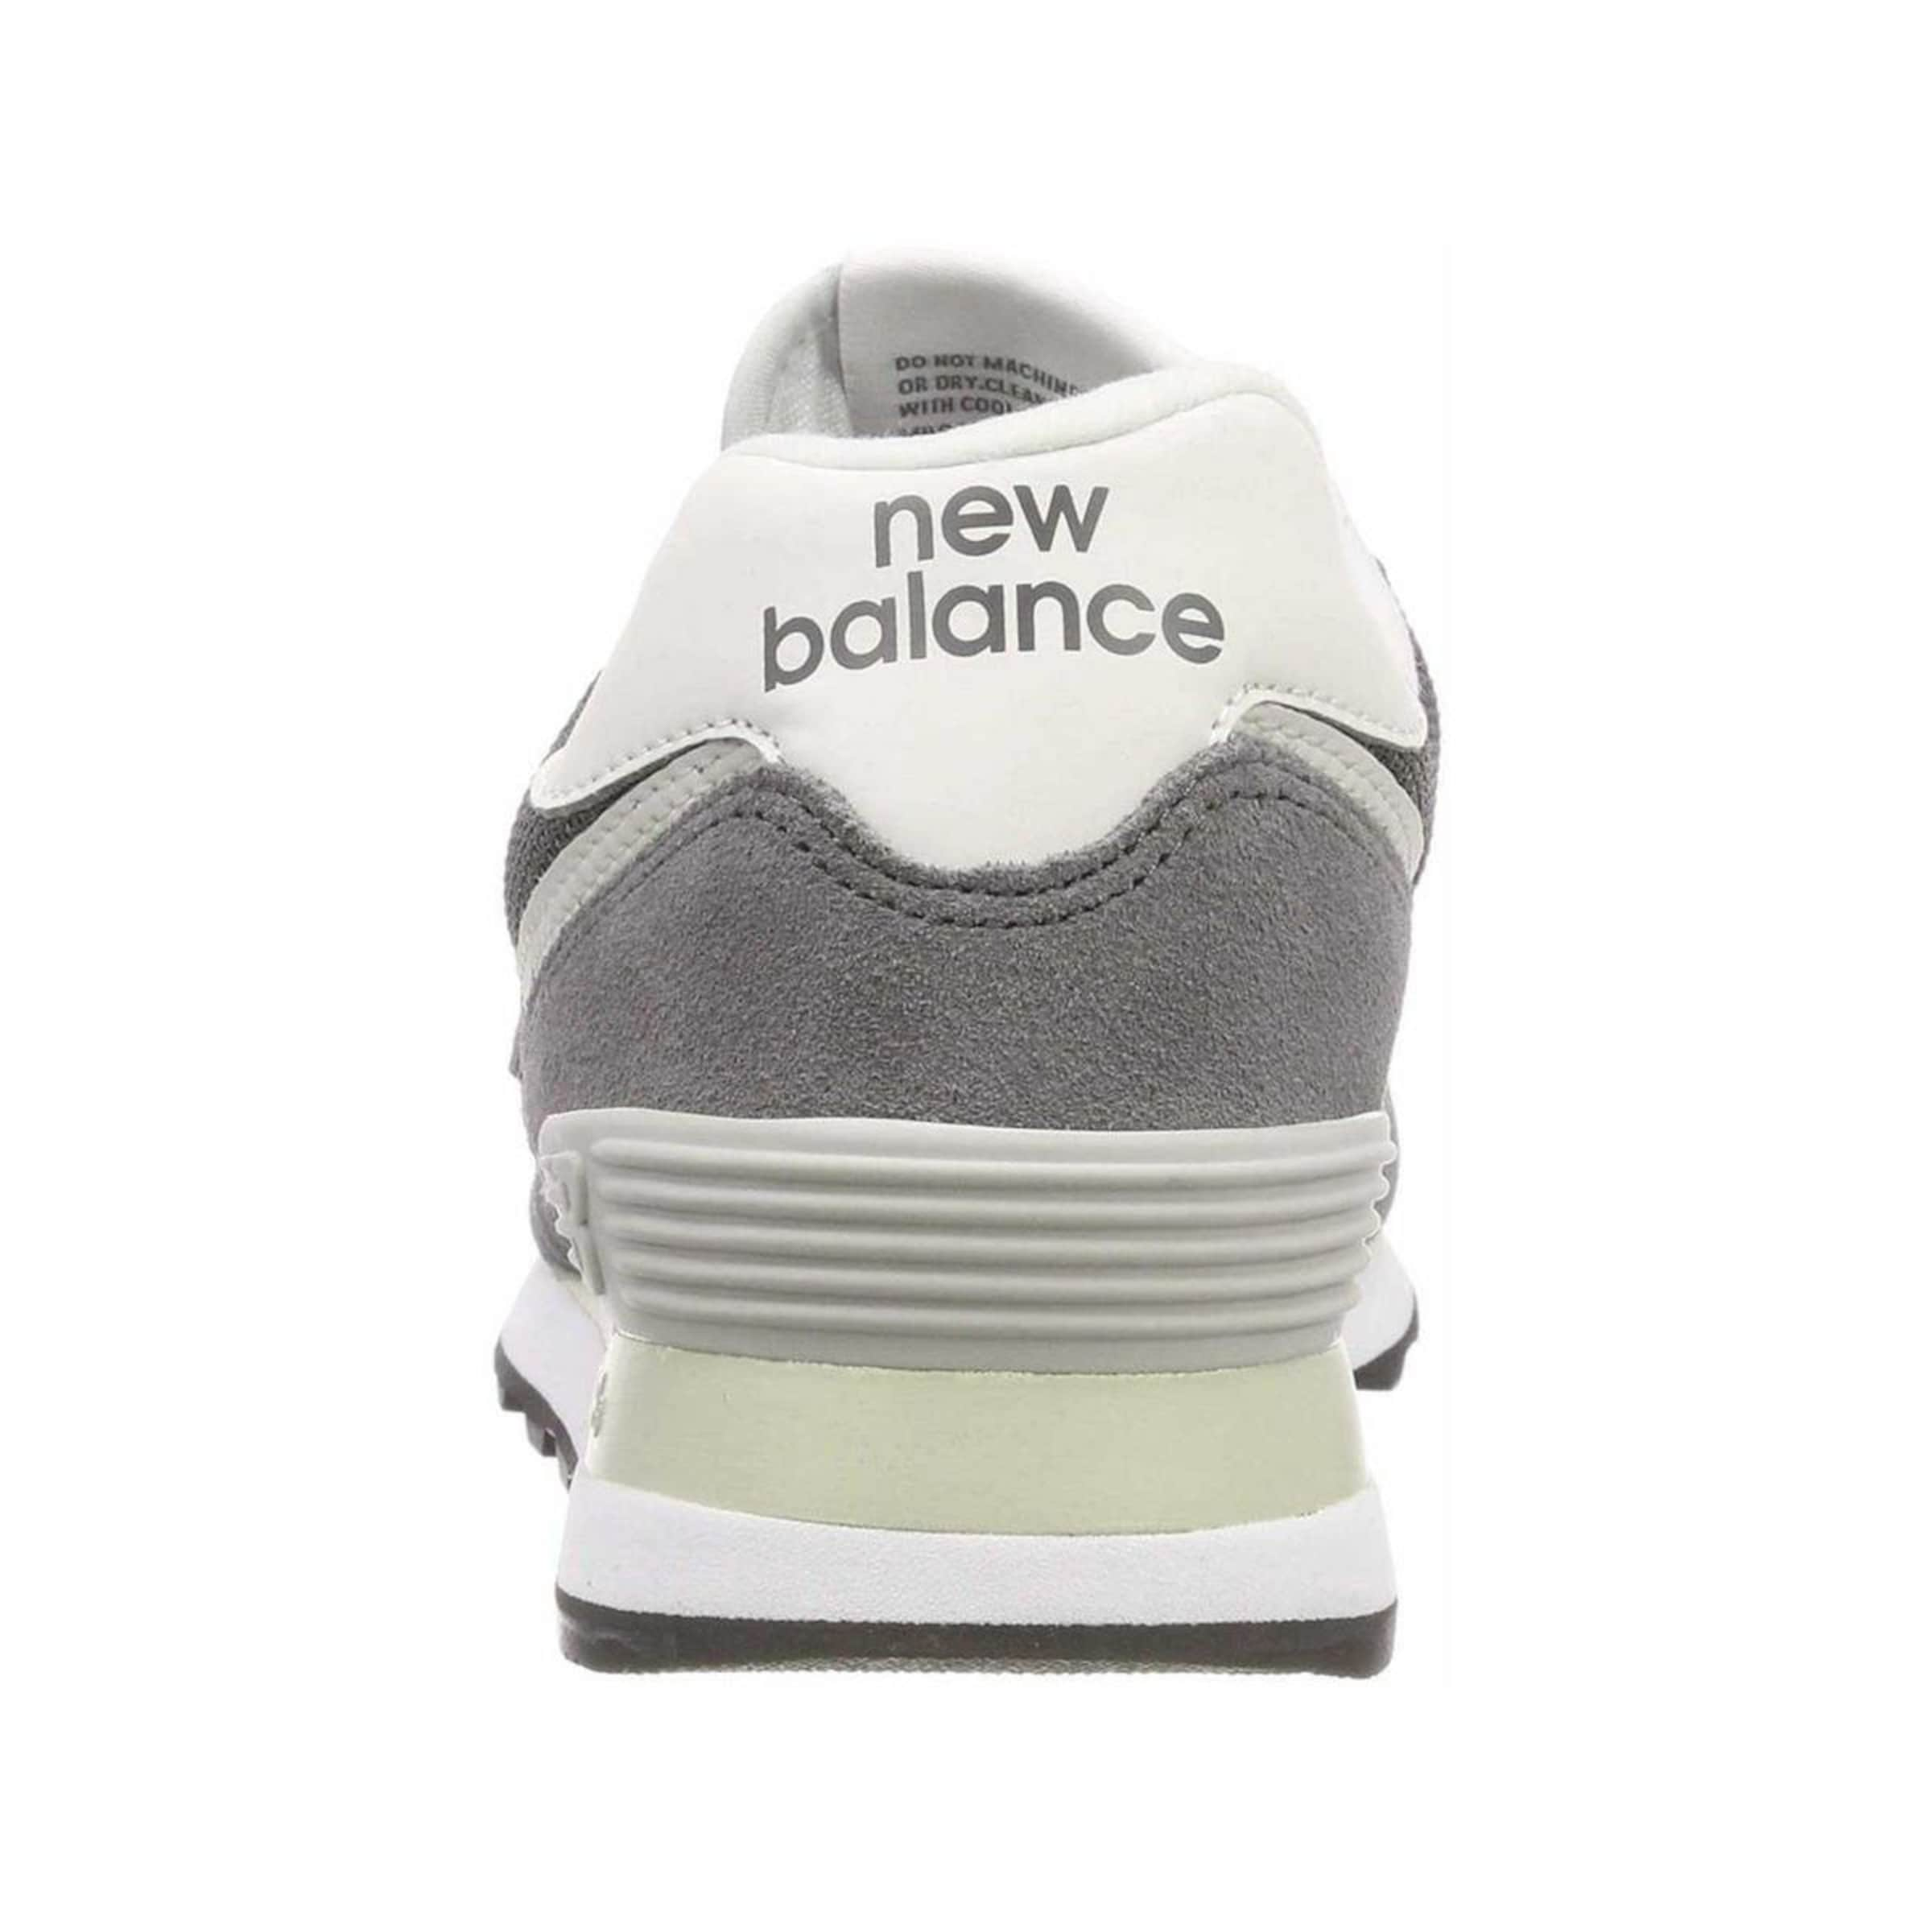 New New Balance New Grau Balance In In Balance Grau Schnürschuhe Schnürschuhe VUzpSM